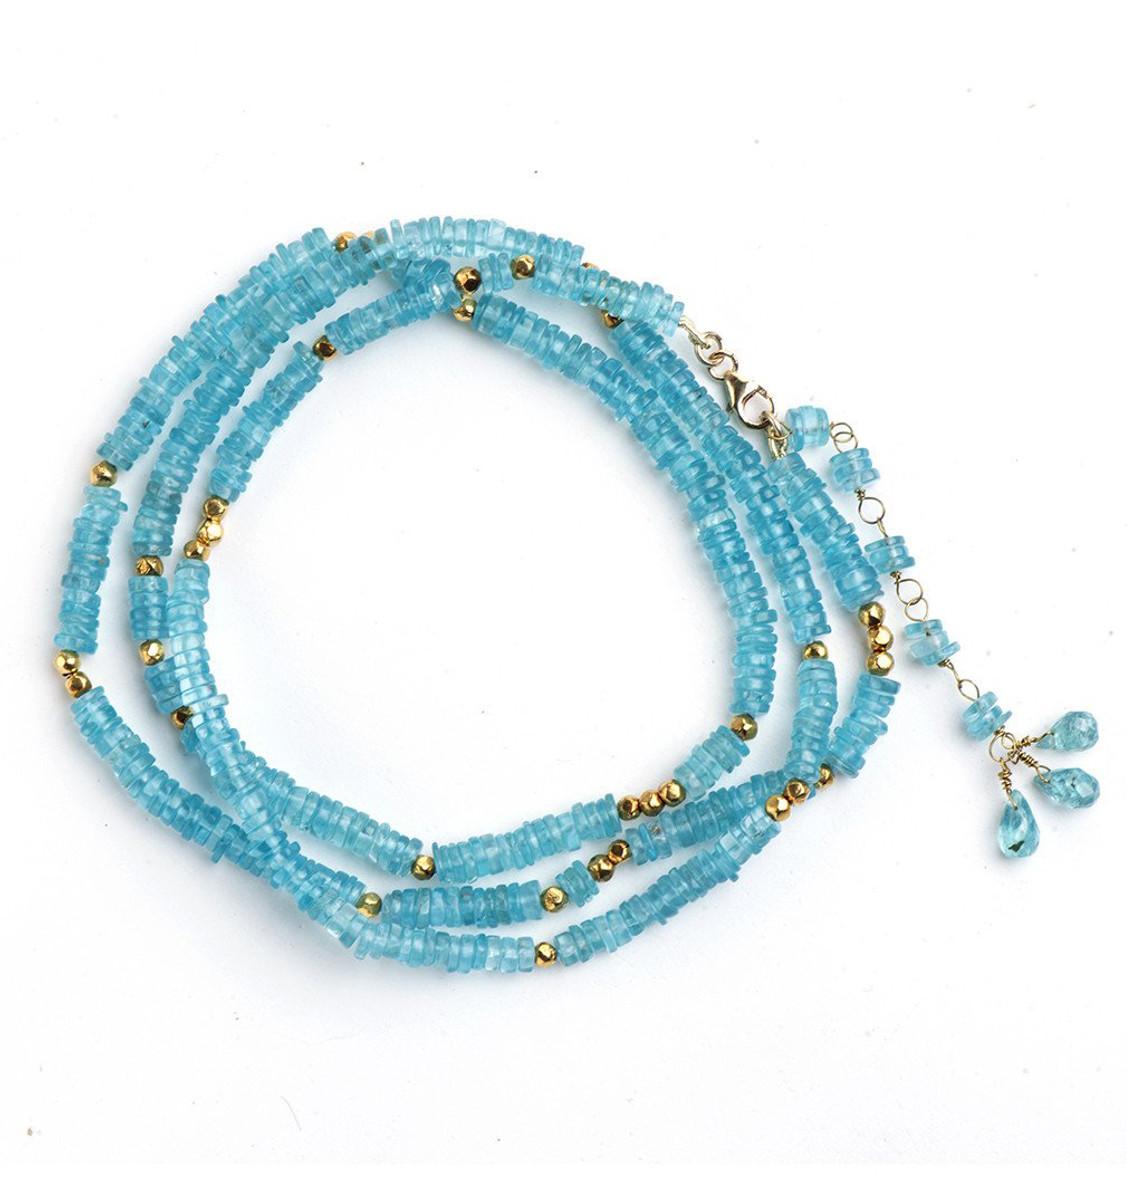 Harmony Blue Bracelet by Nava Zahavi - New Arrival